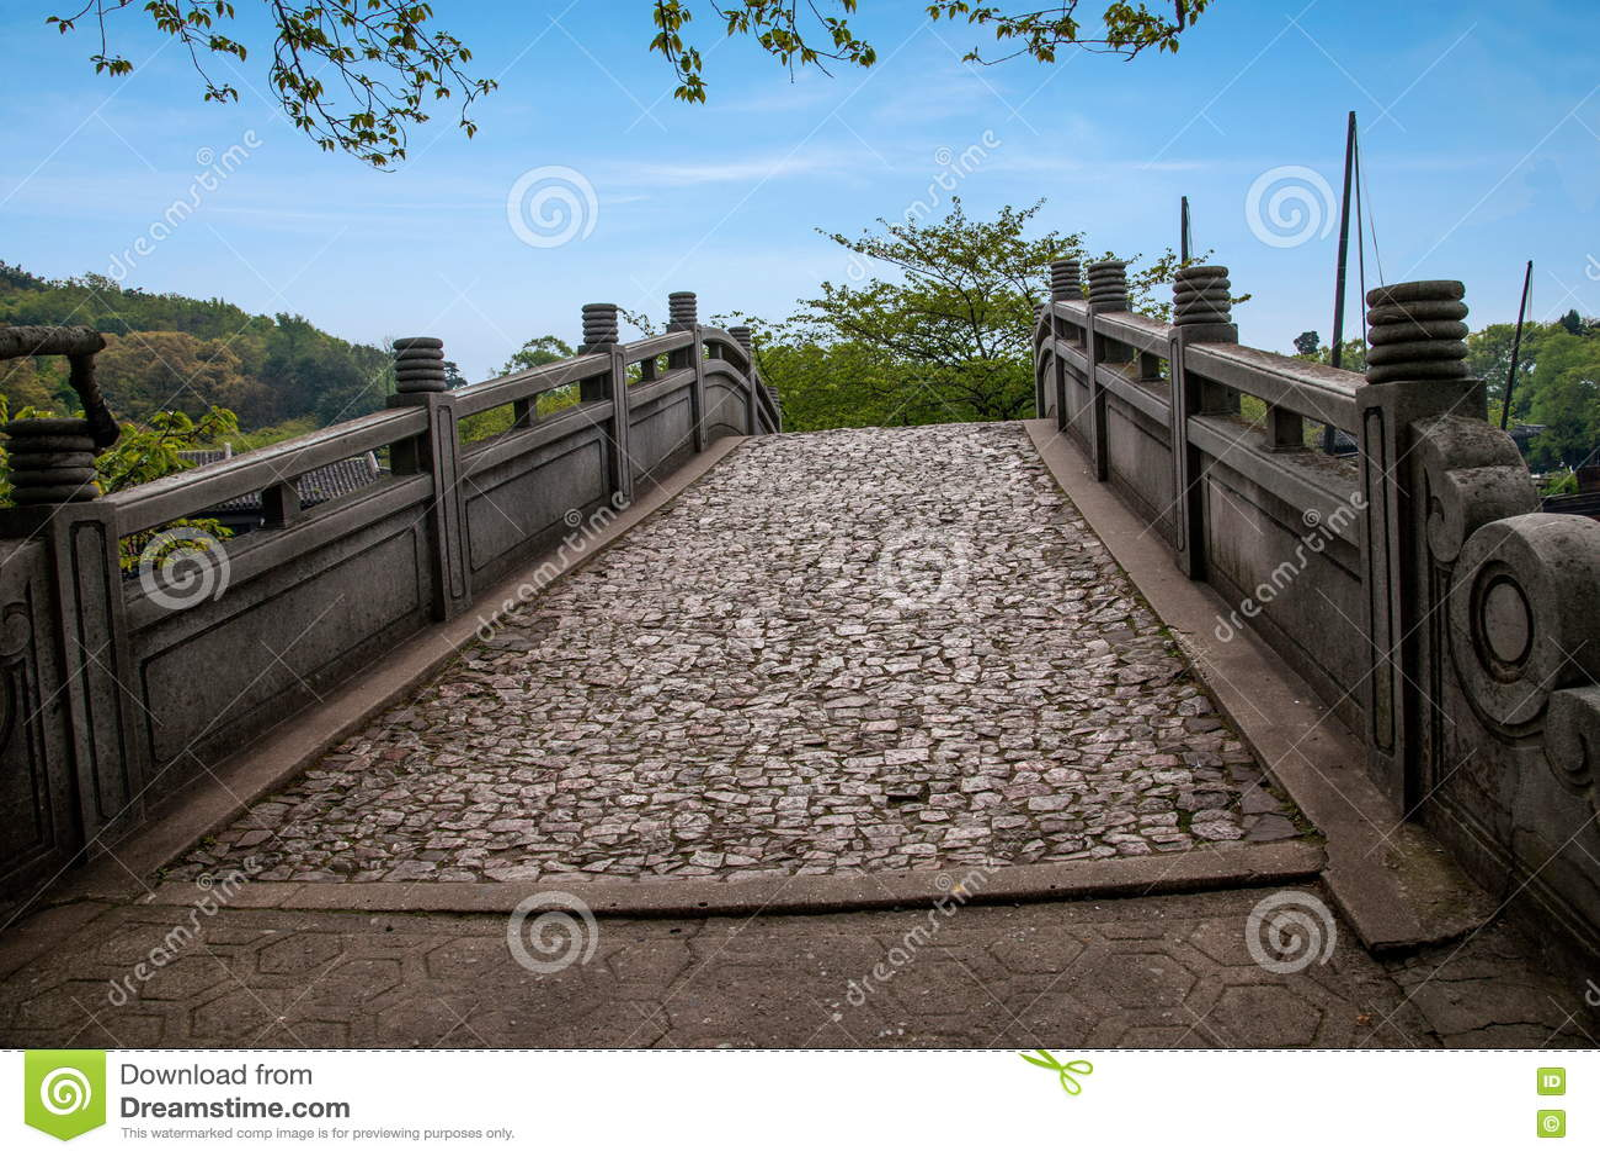 Wuxi Taihu Yuantouzhu stone bridge and deck